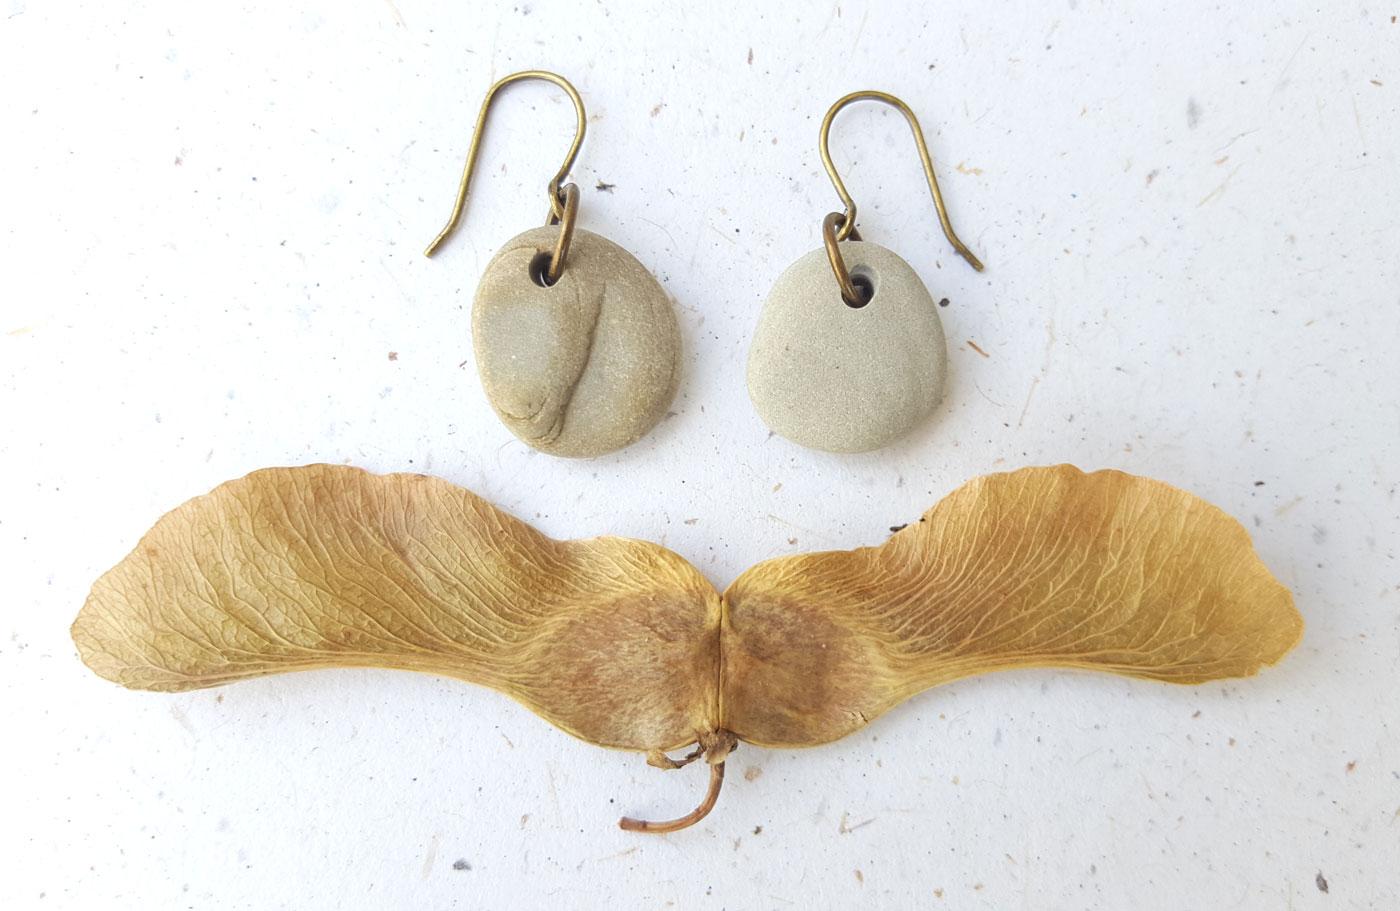 Beach stone earrings by Jenny Hoople of Authentic Arts